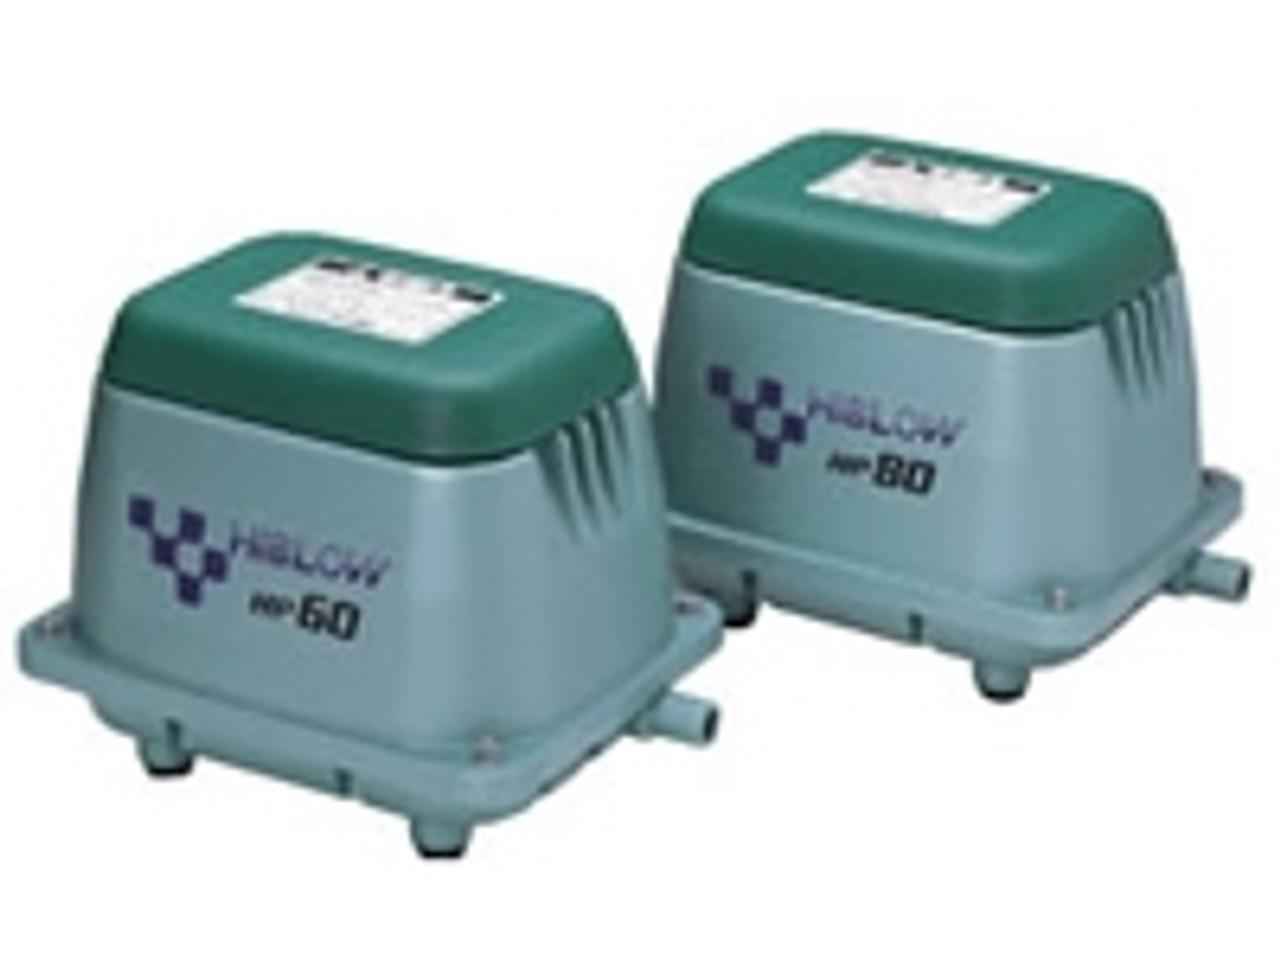 HP80 Hi-Blow Techno Takatsuki Air Pump for Water Treatment Units